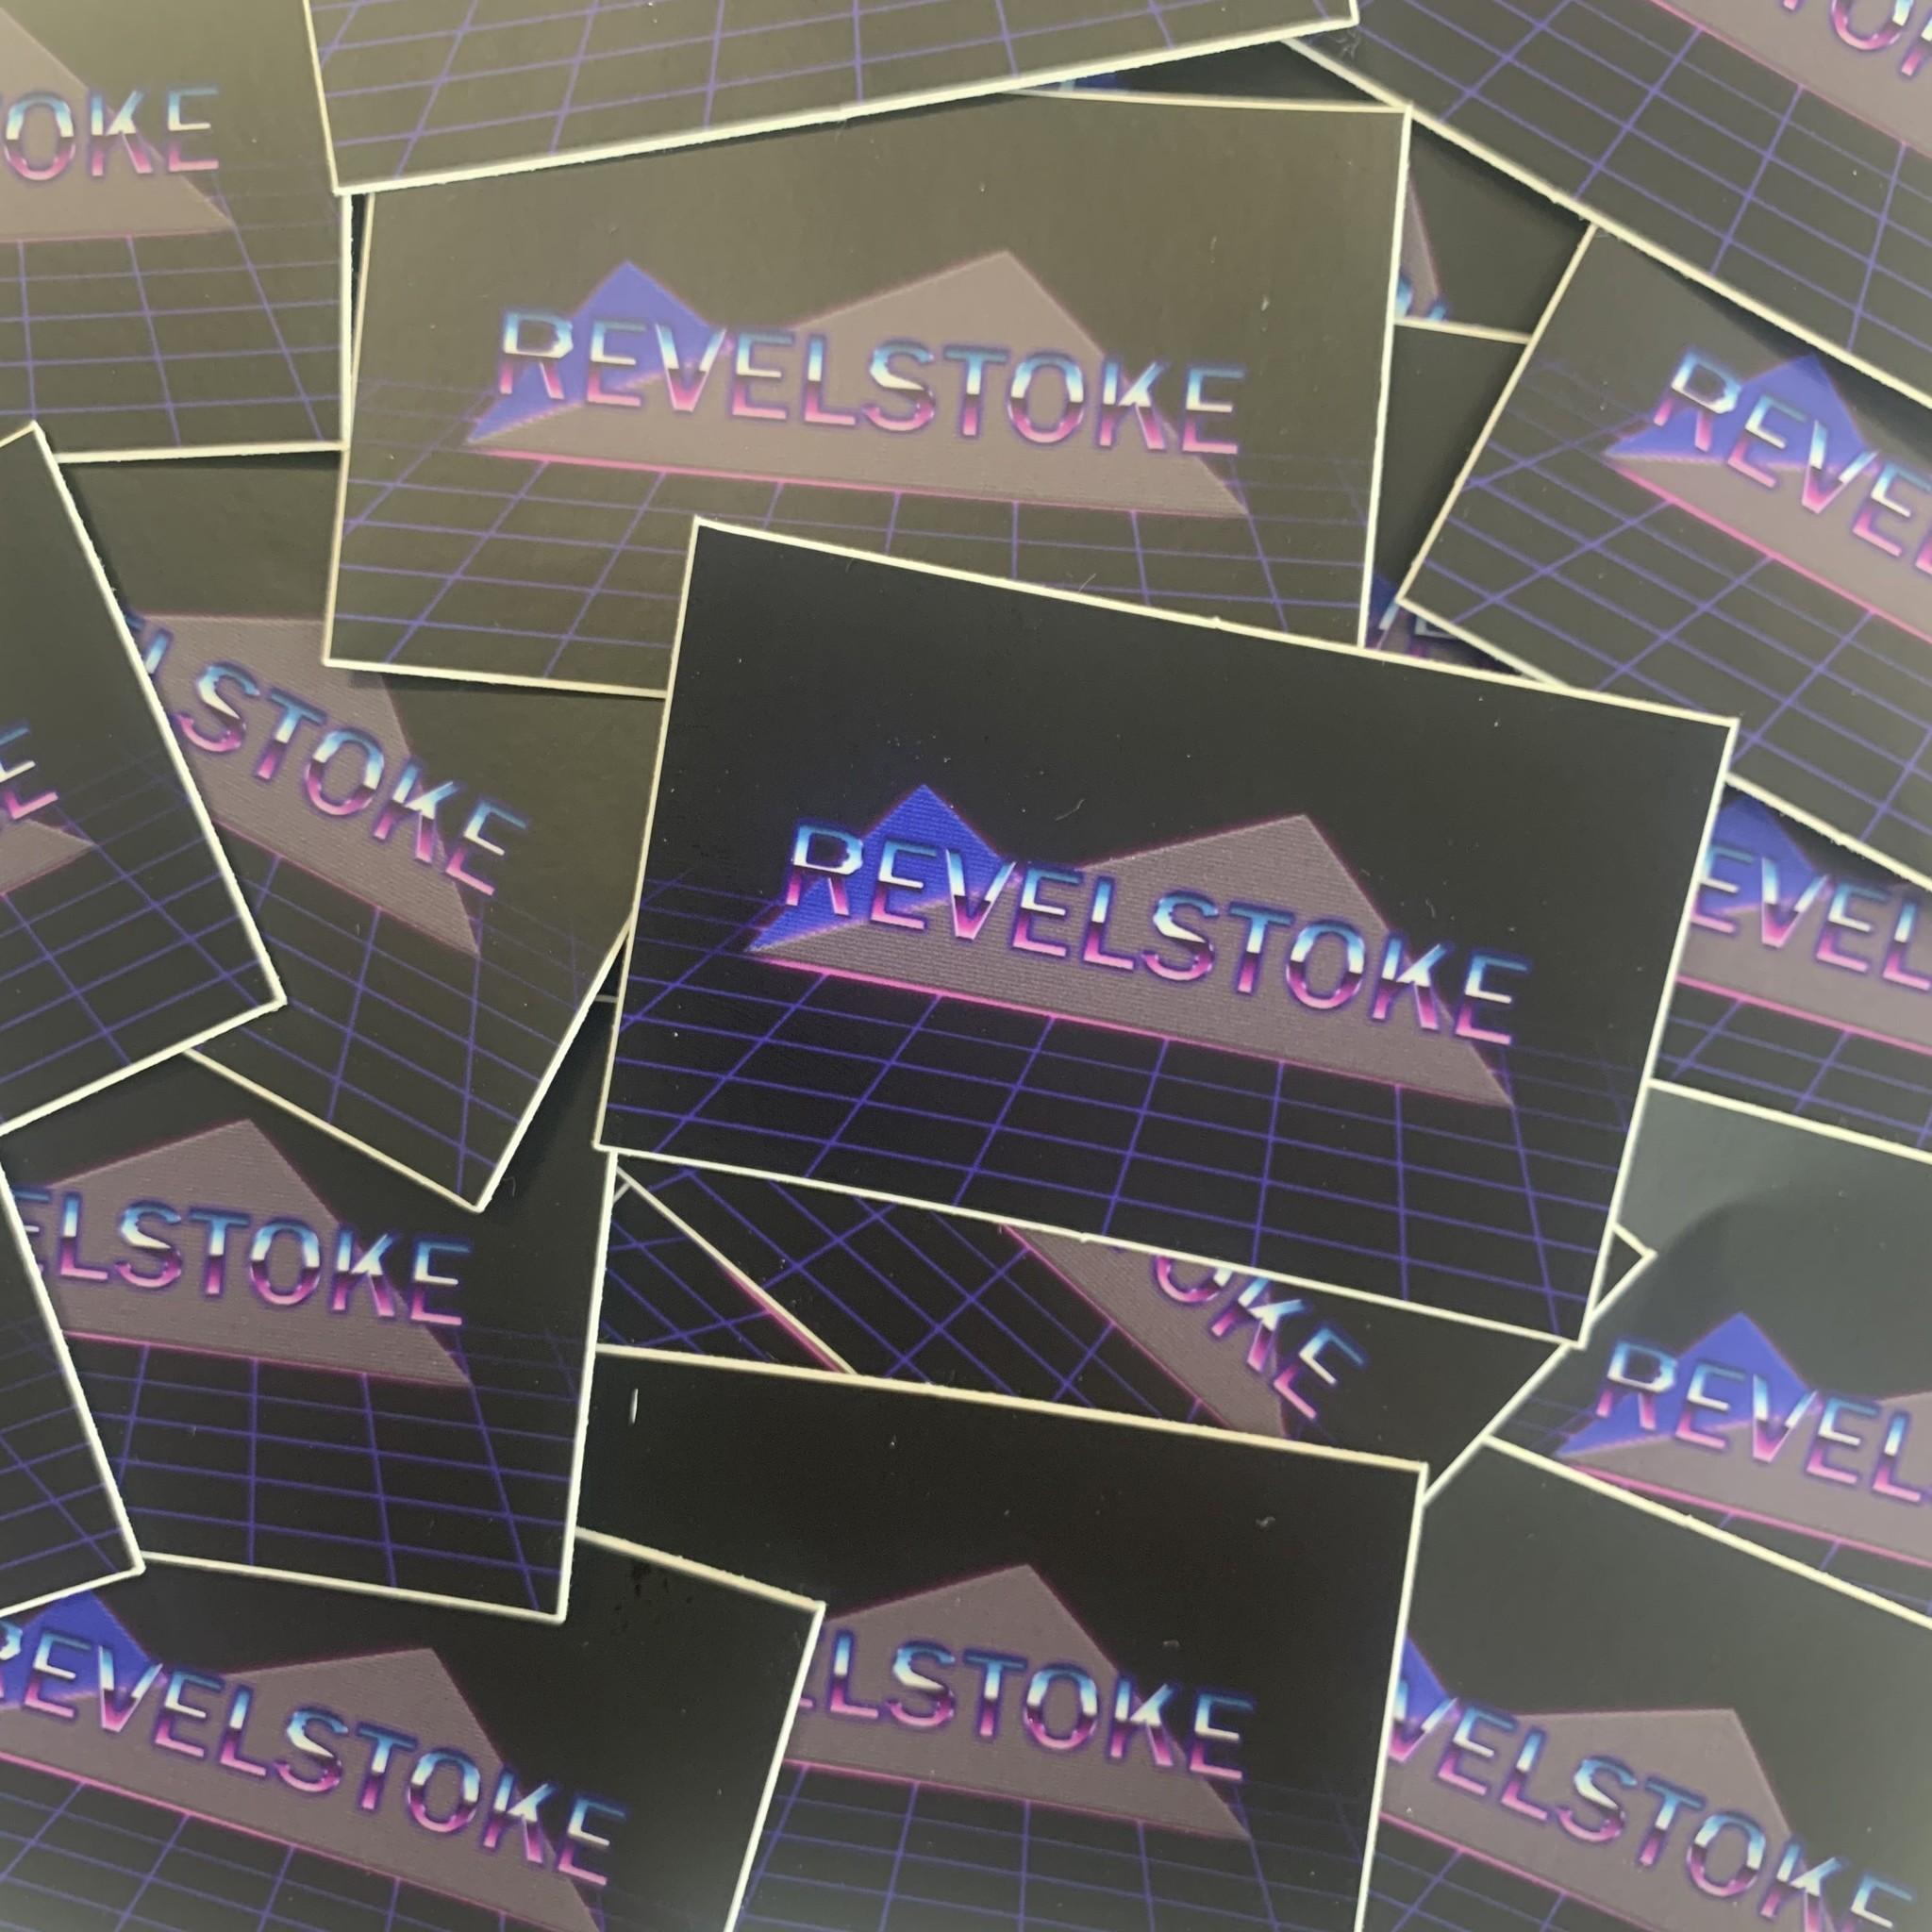 Trading Co. Revelstoke Disco Sticker